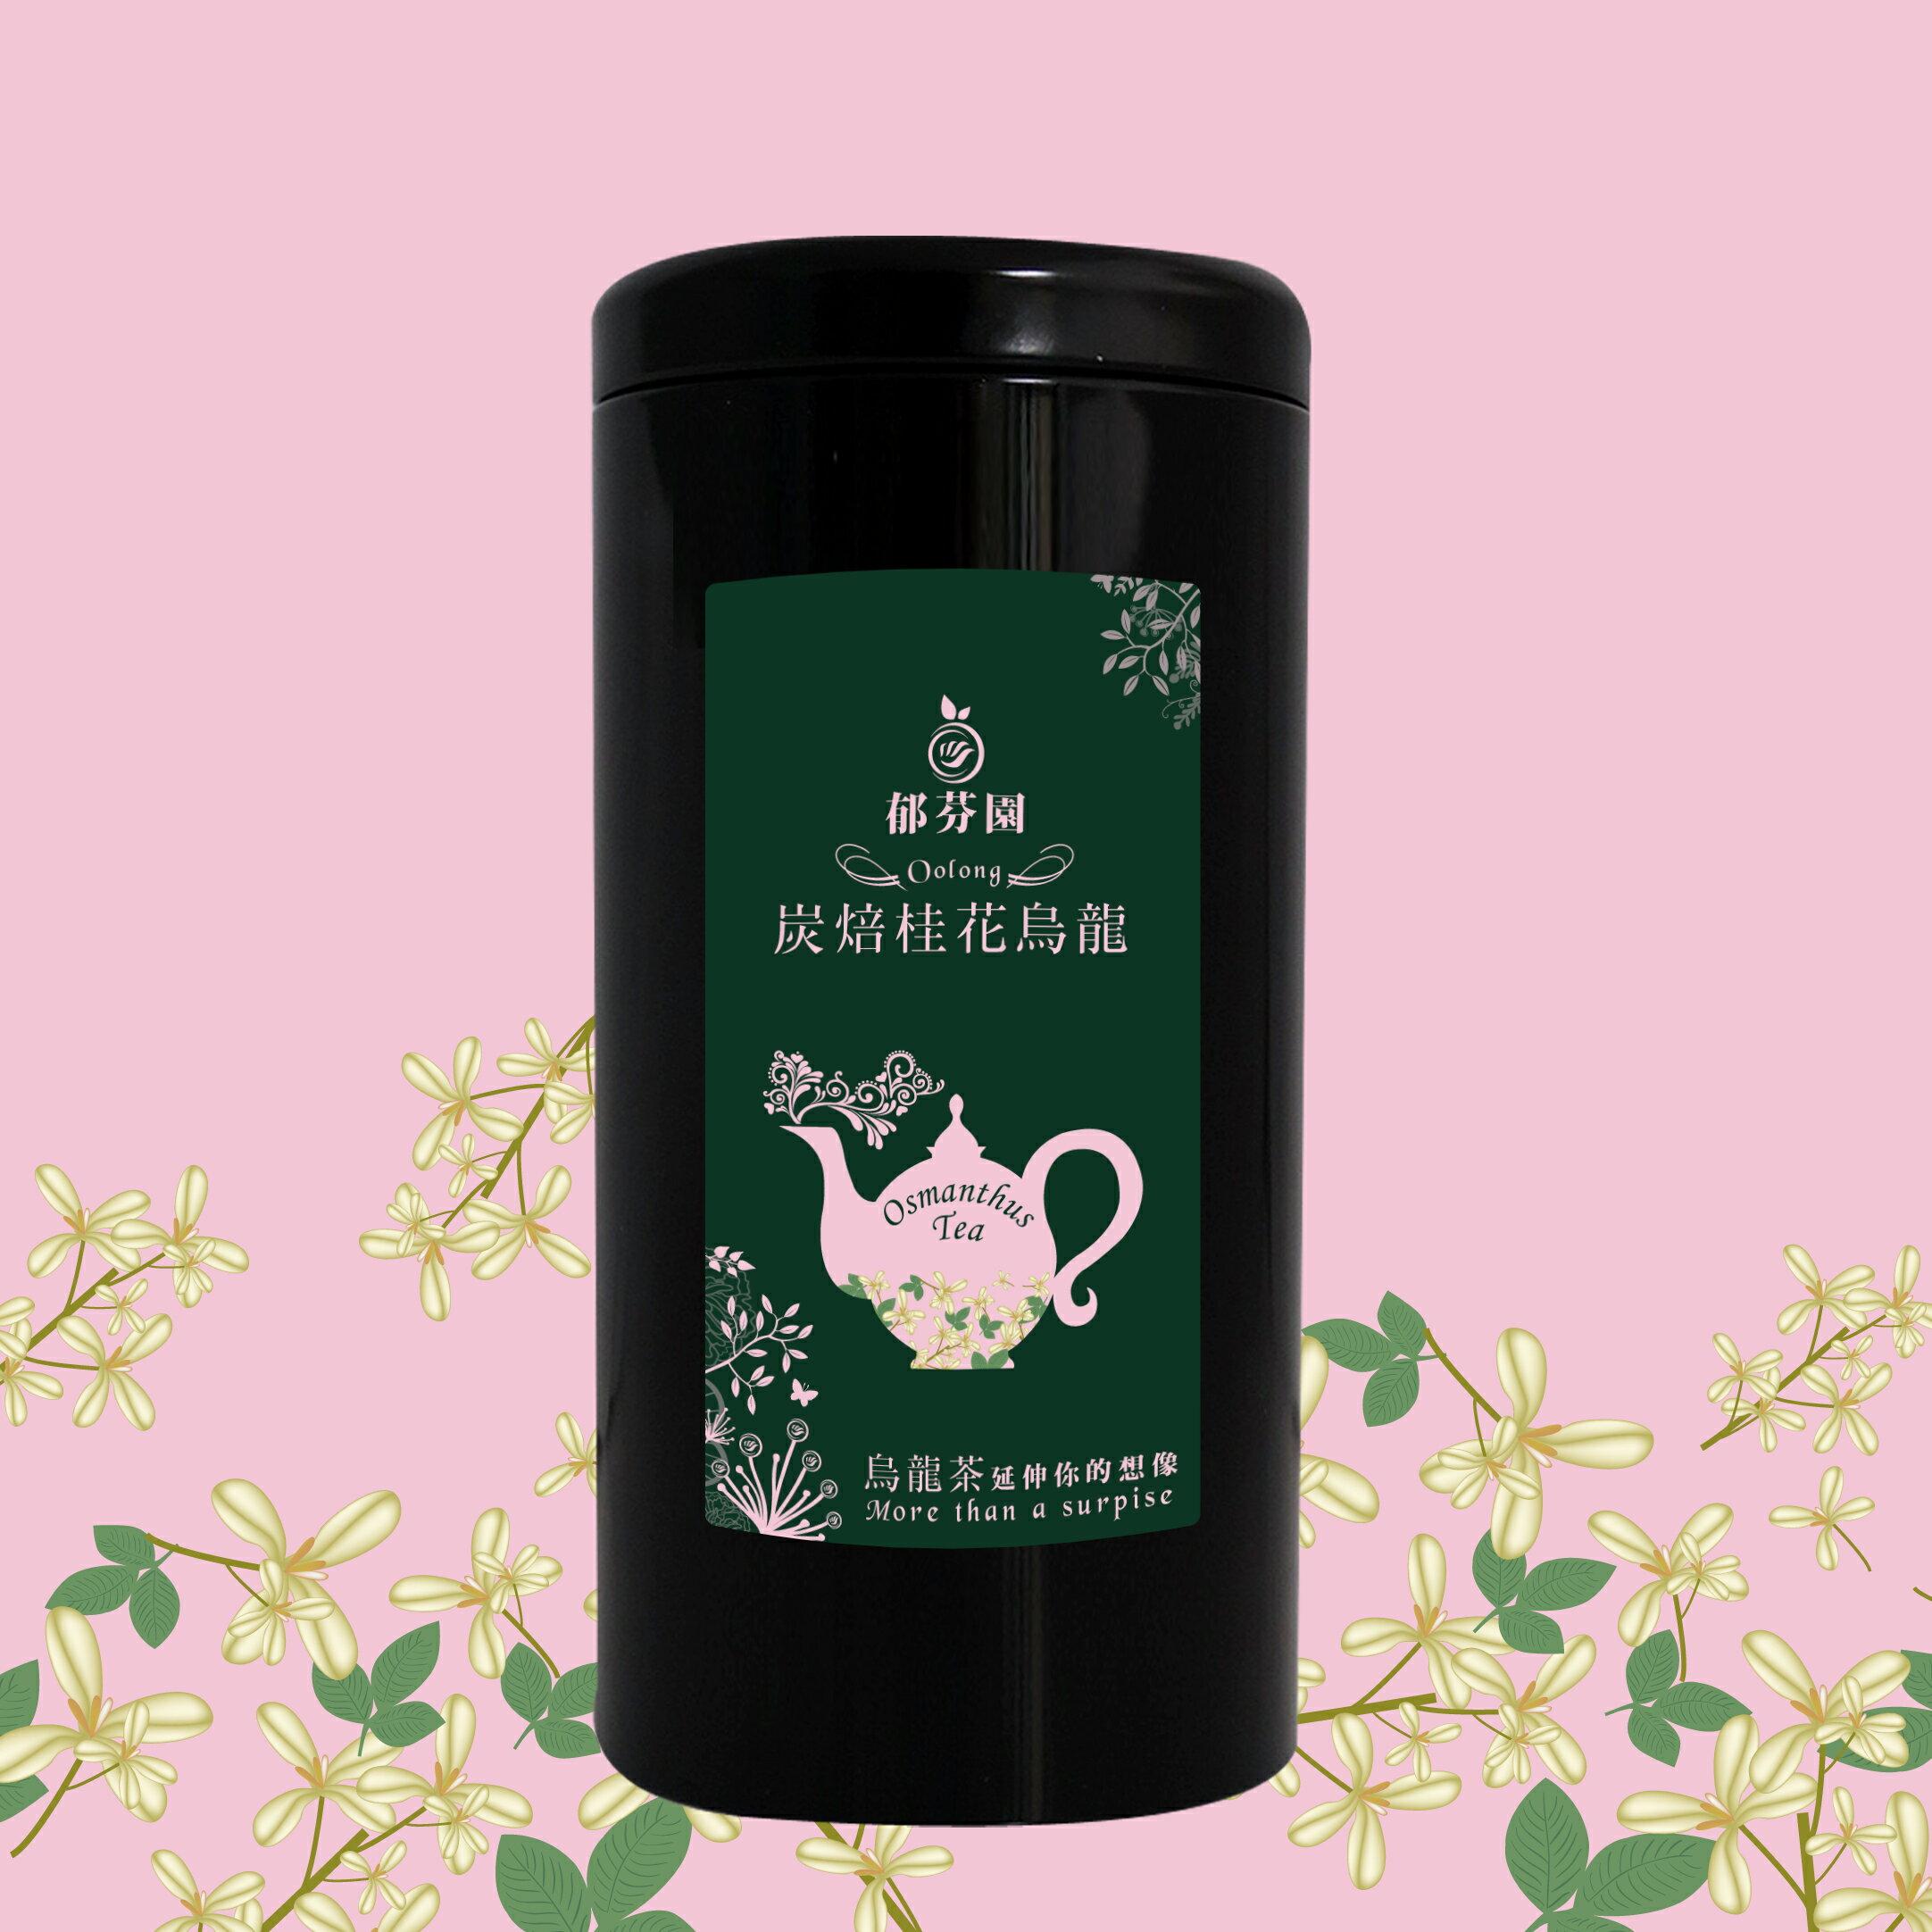 炭焙桂花烏龍 100g 罐 Osmanthus Oolong Tea ~~~~~ ~歐式烏